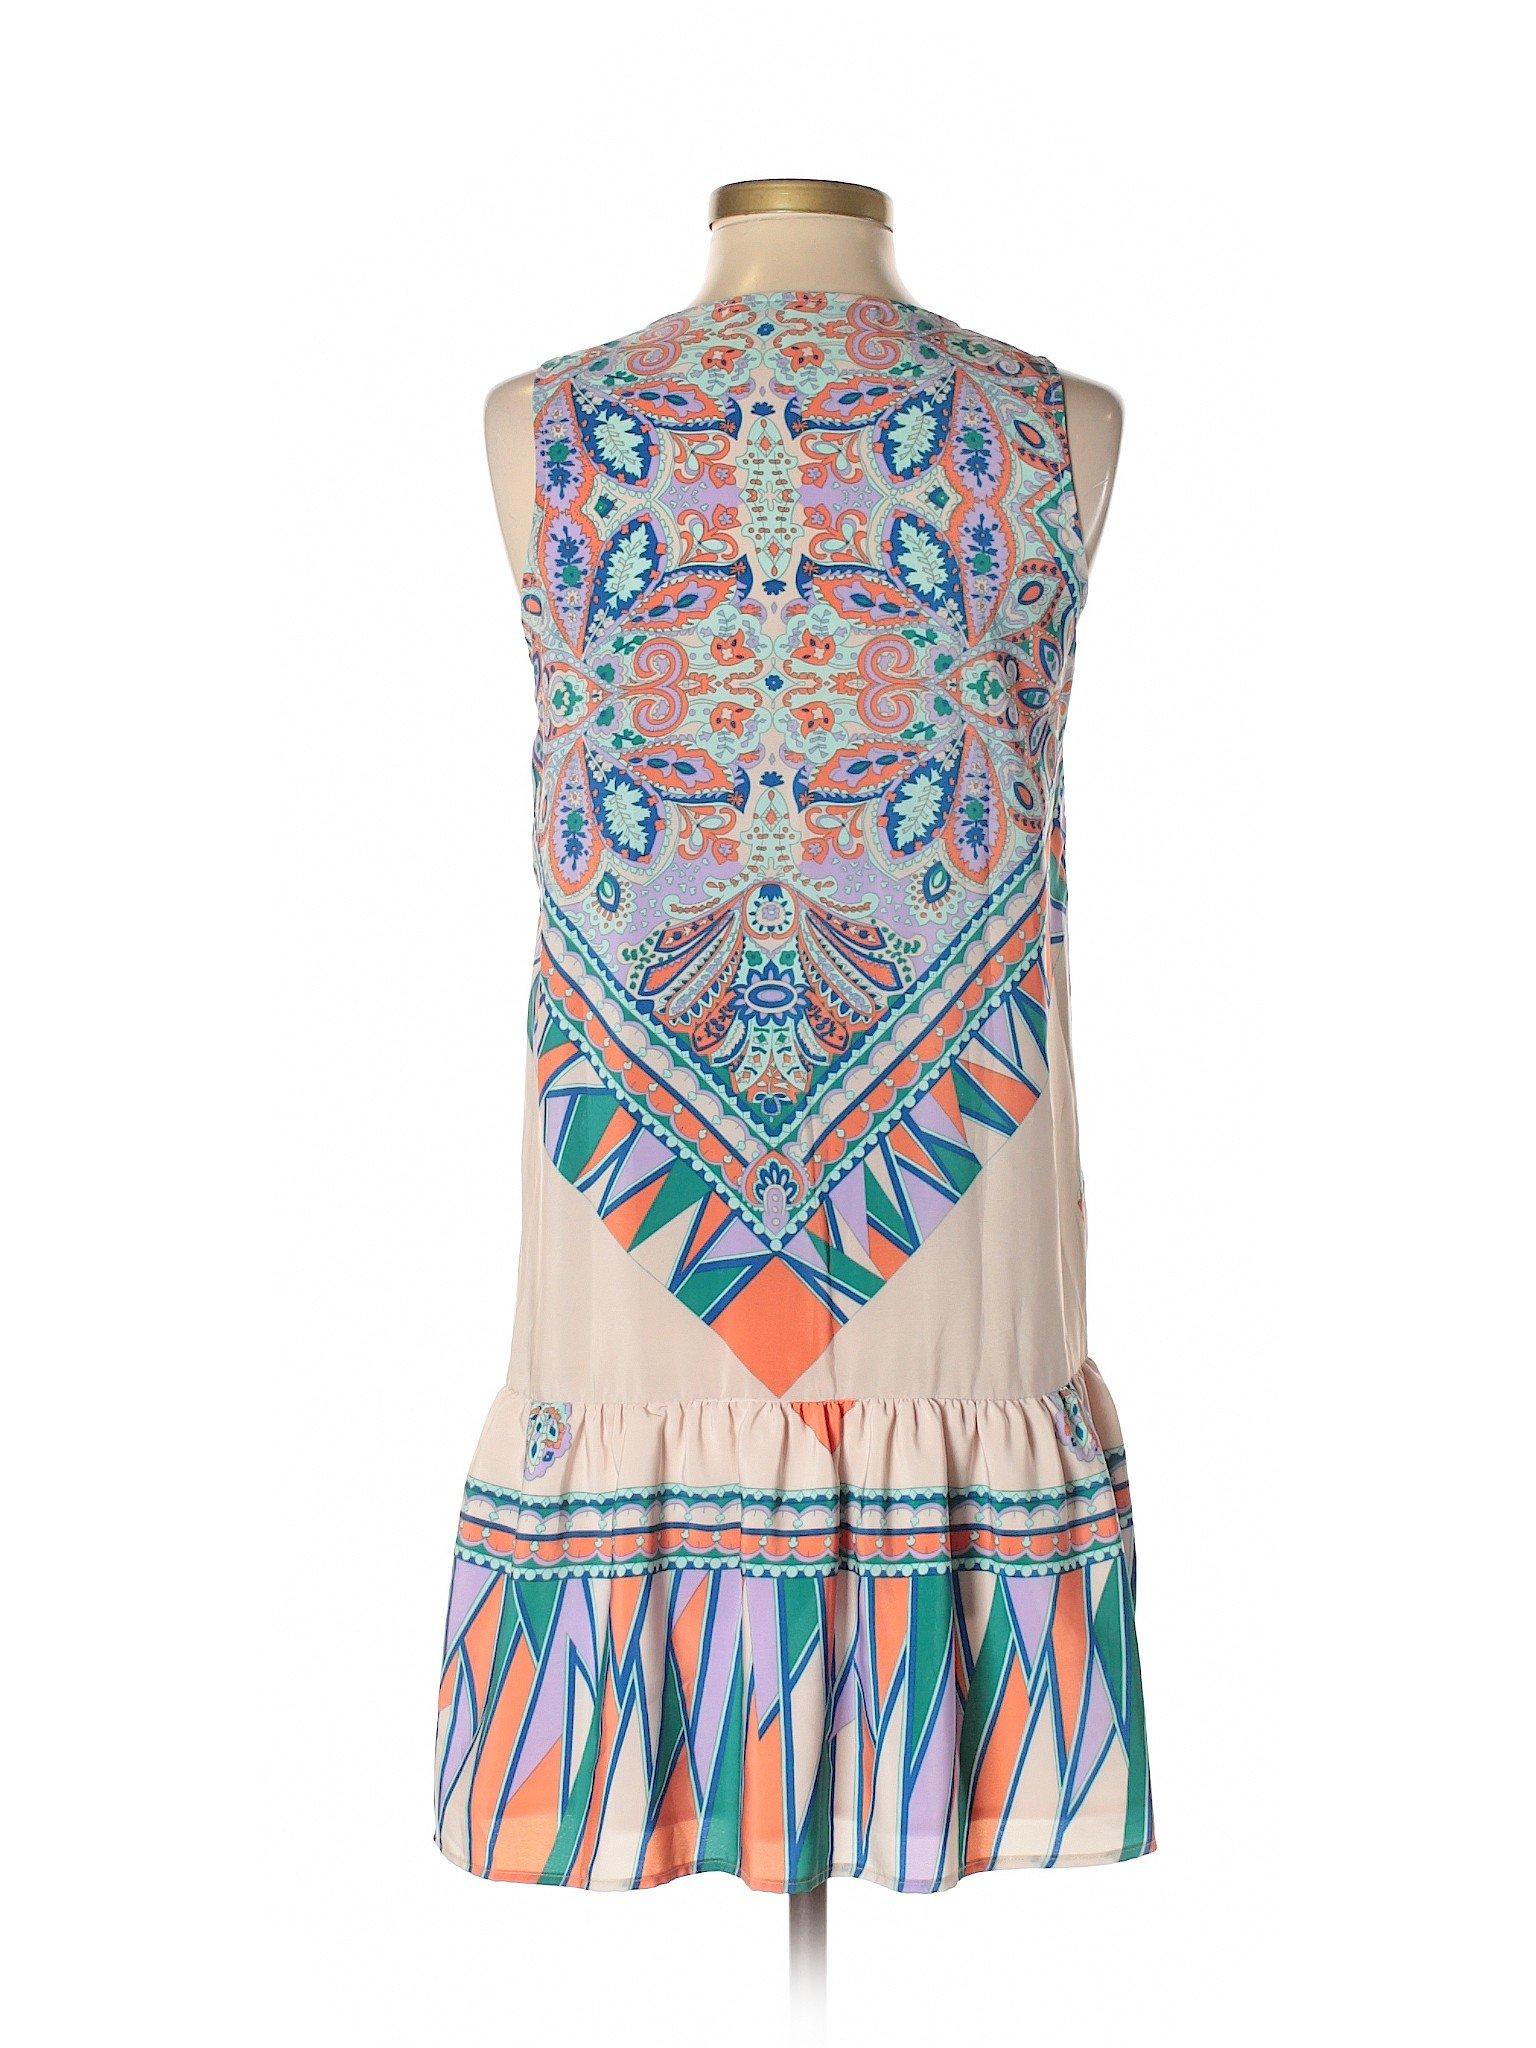 Casual Friends Winter Boutique Lovers Dress wx86qqtf